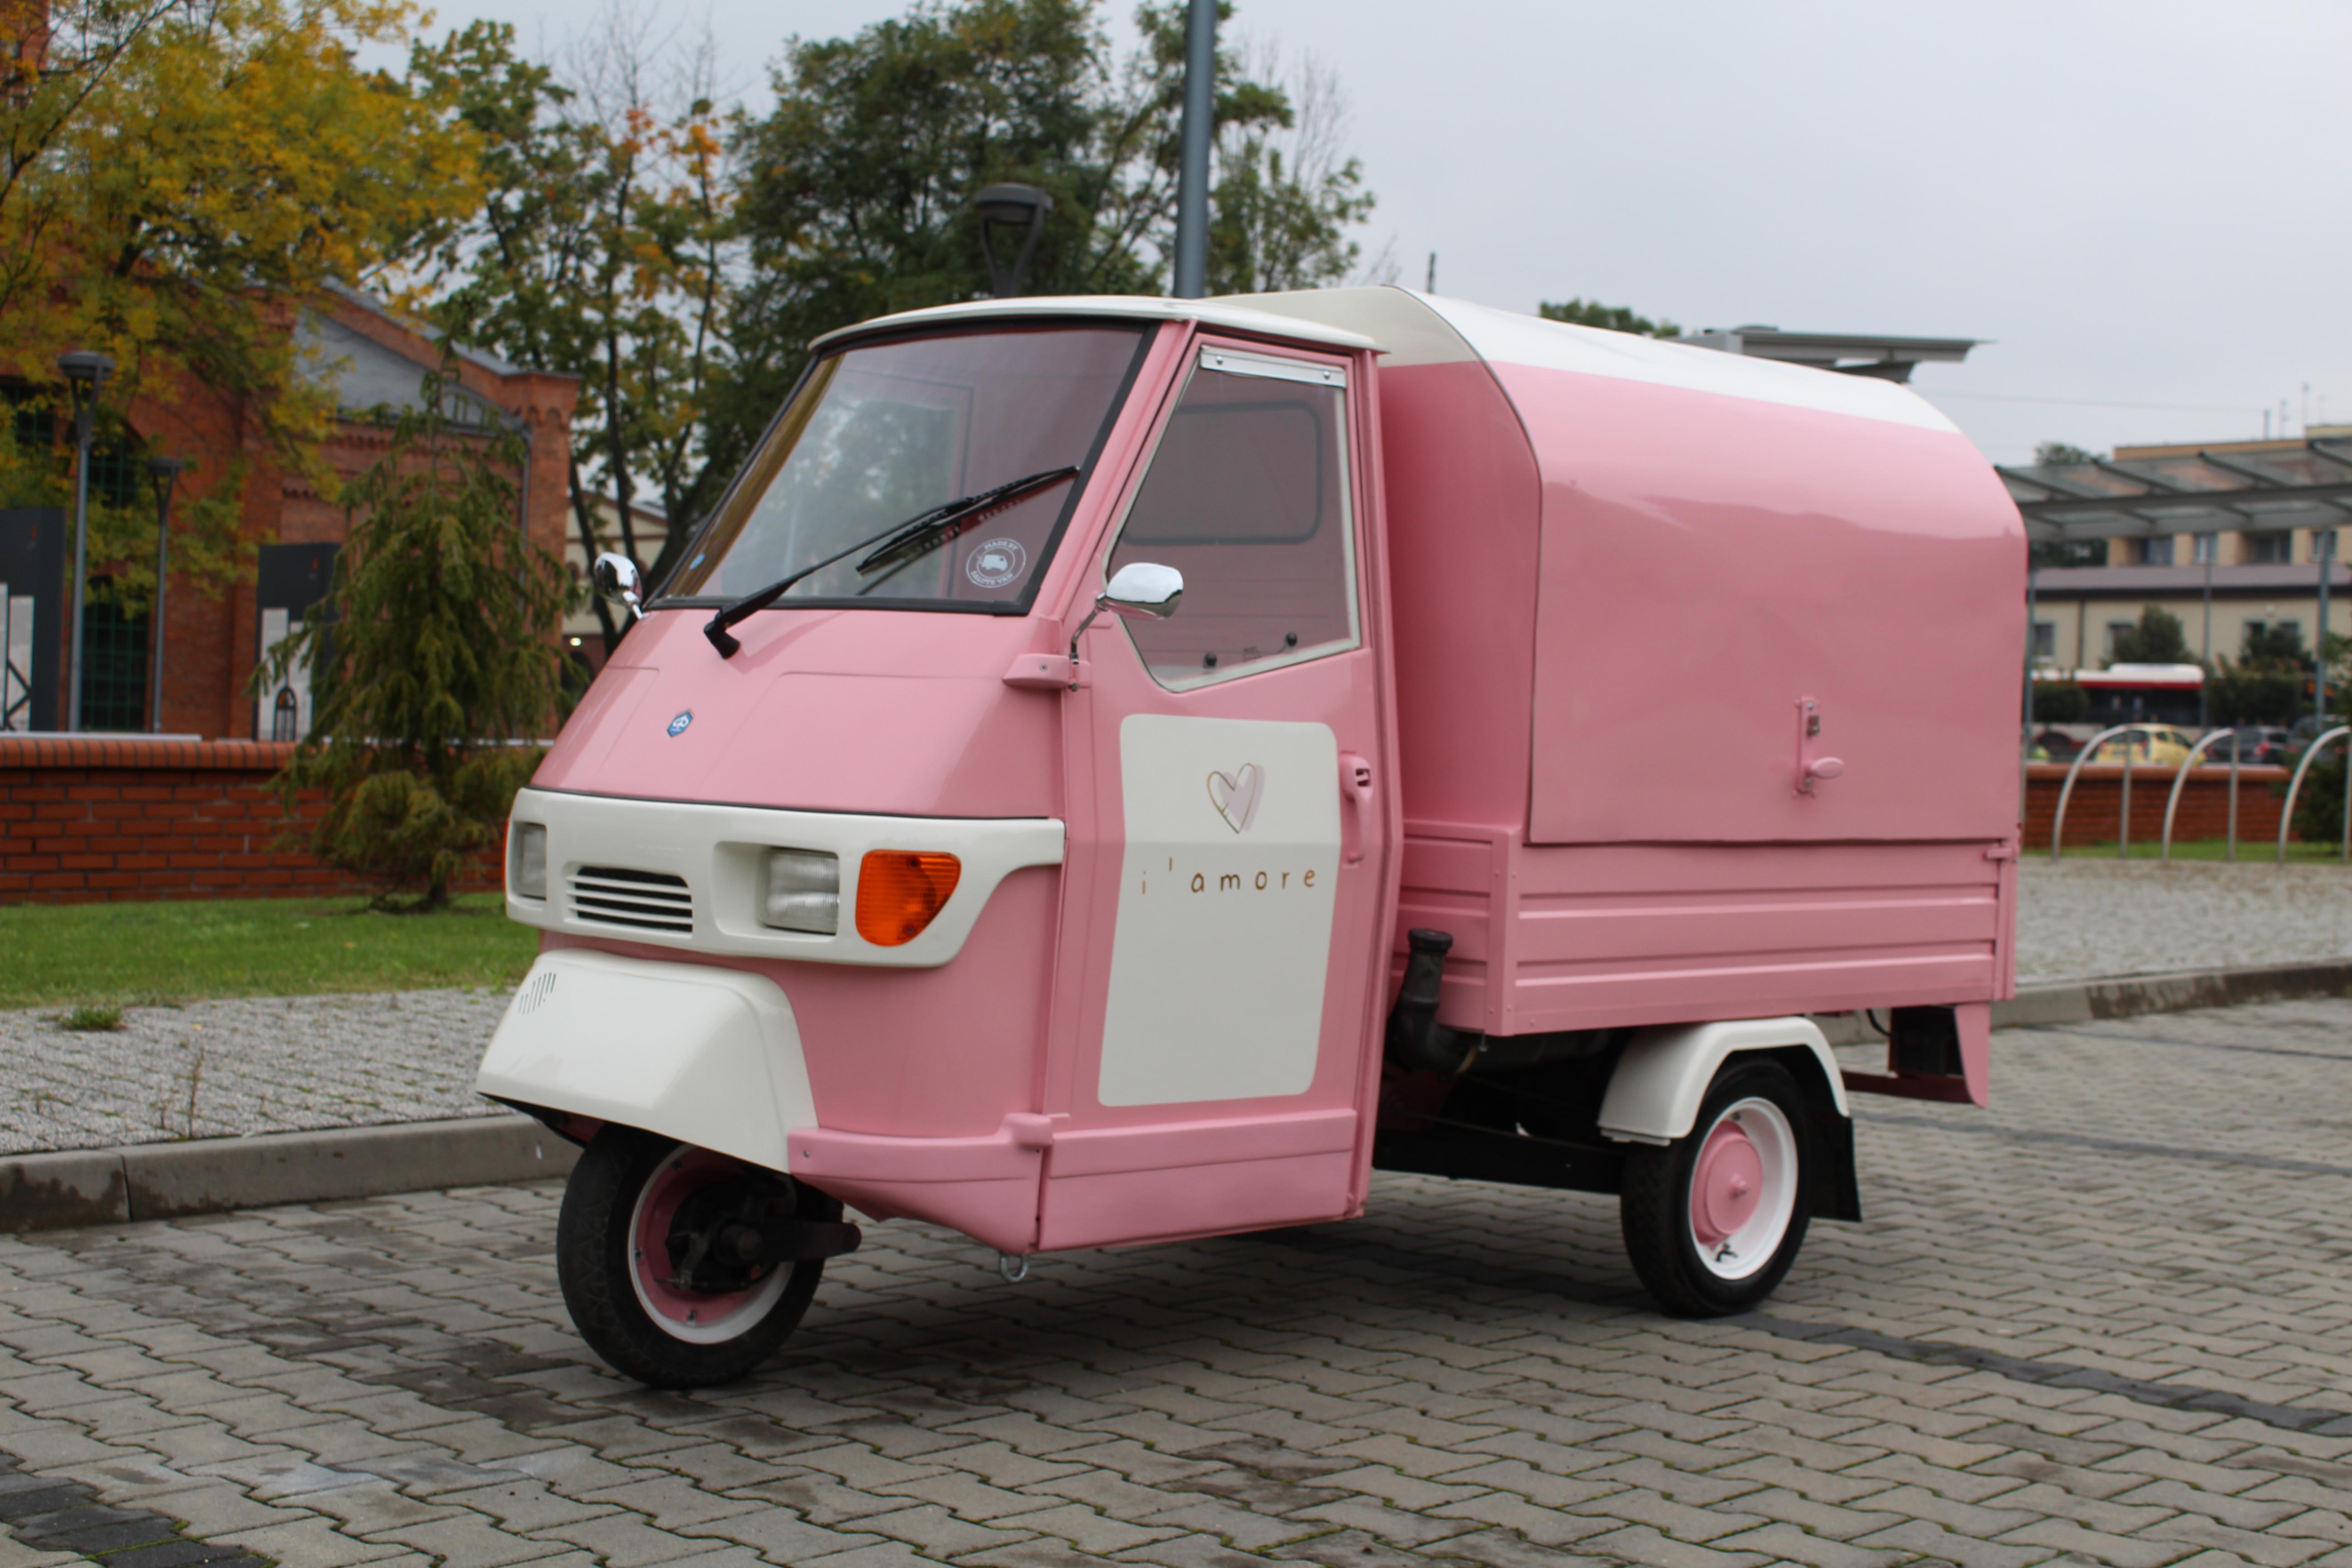 Prosecco & Coffe Van